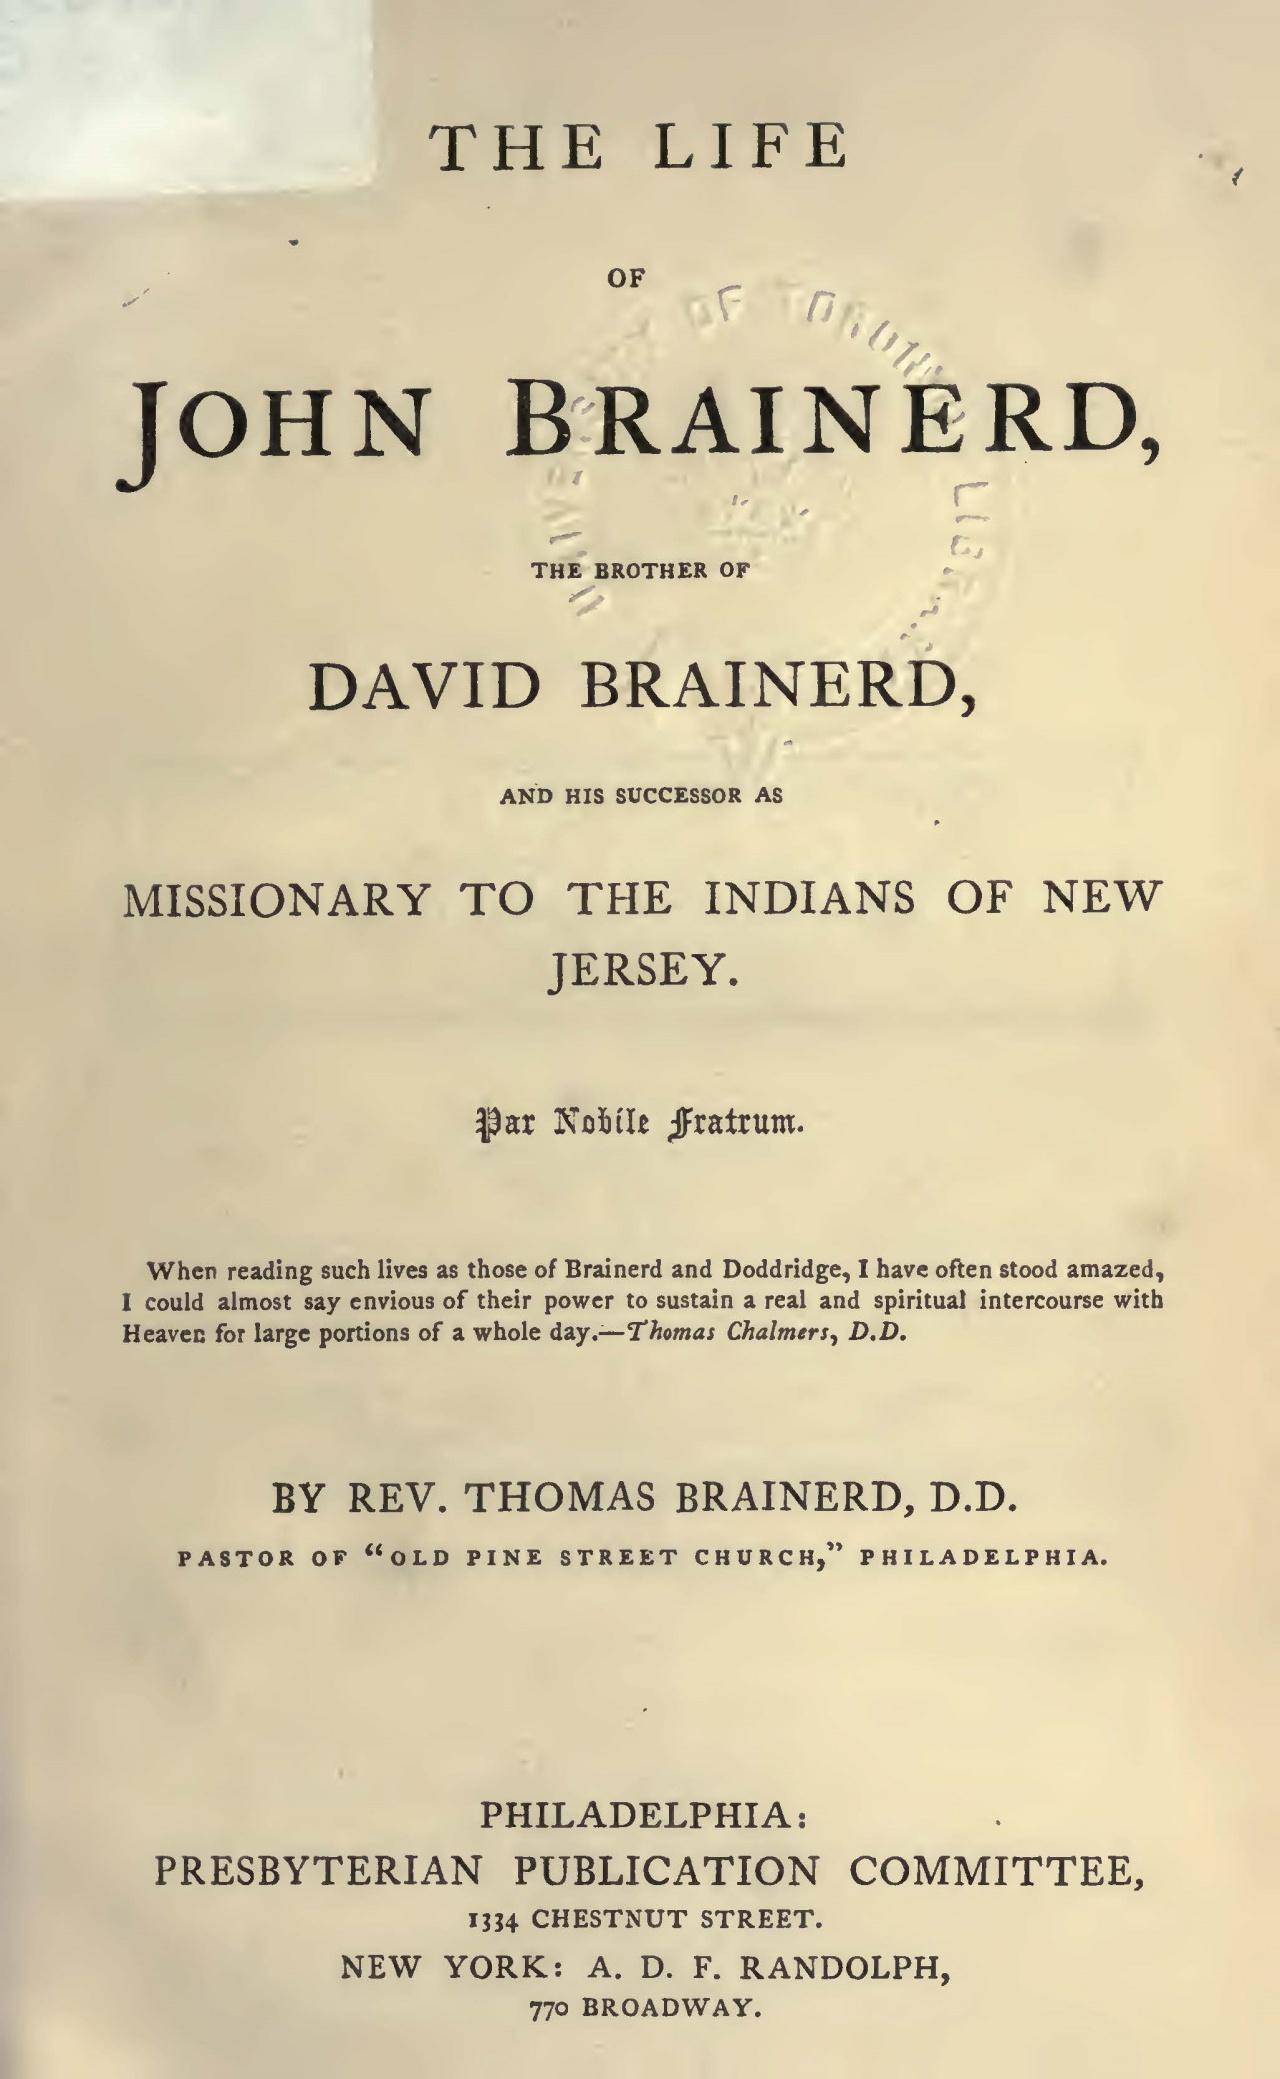 Brainerd, John, The Life of John Brainerd Title Page.jpg